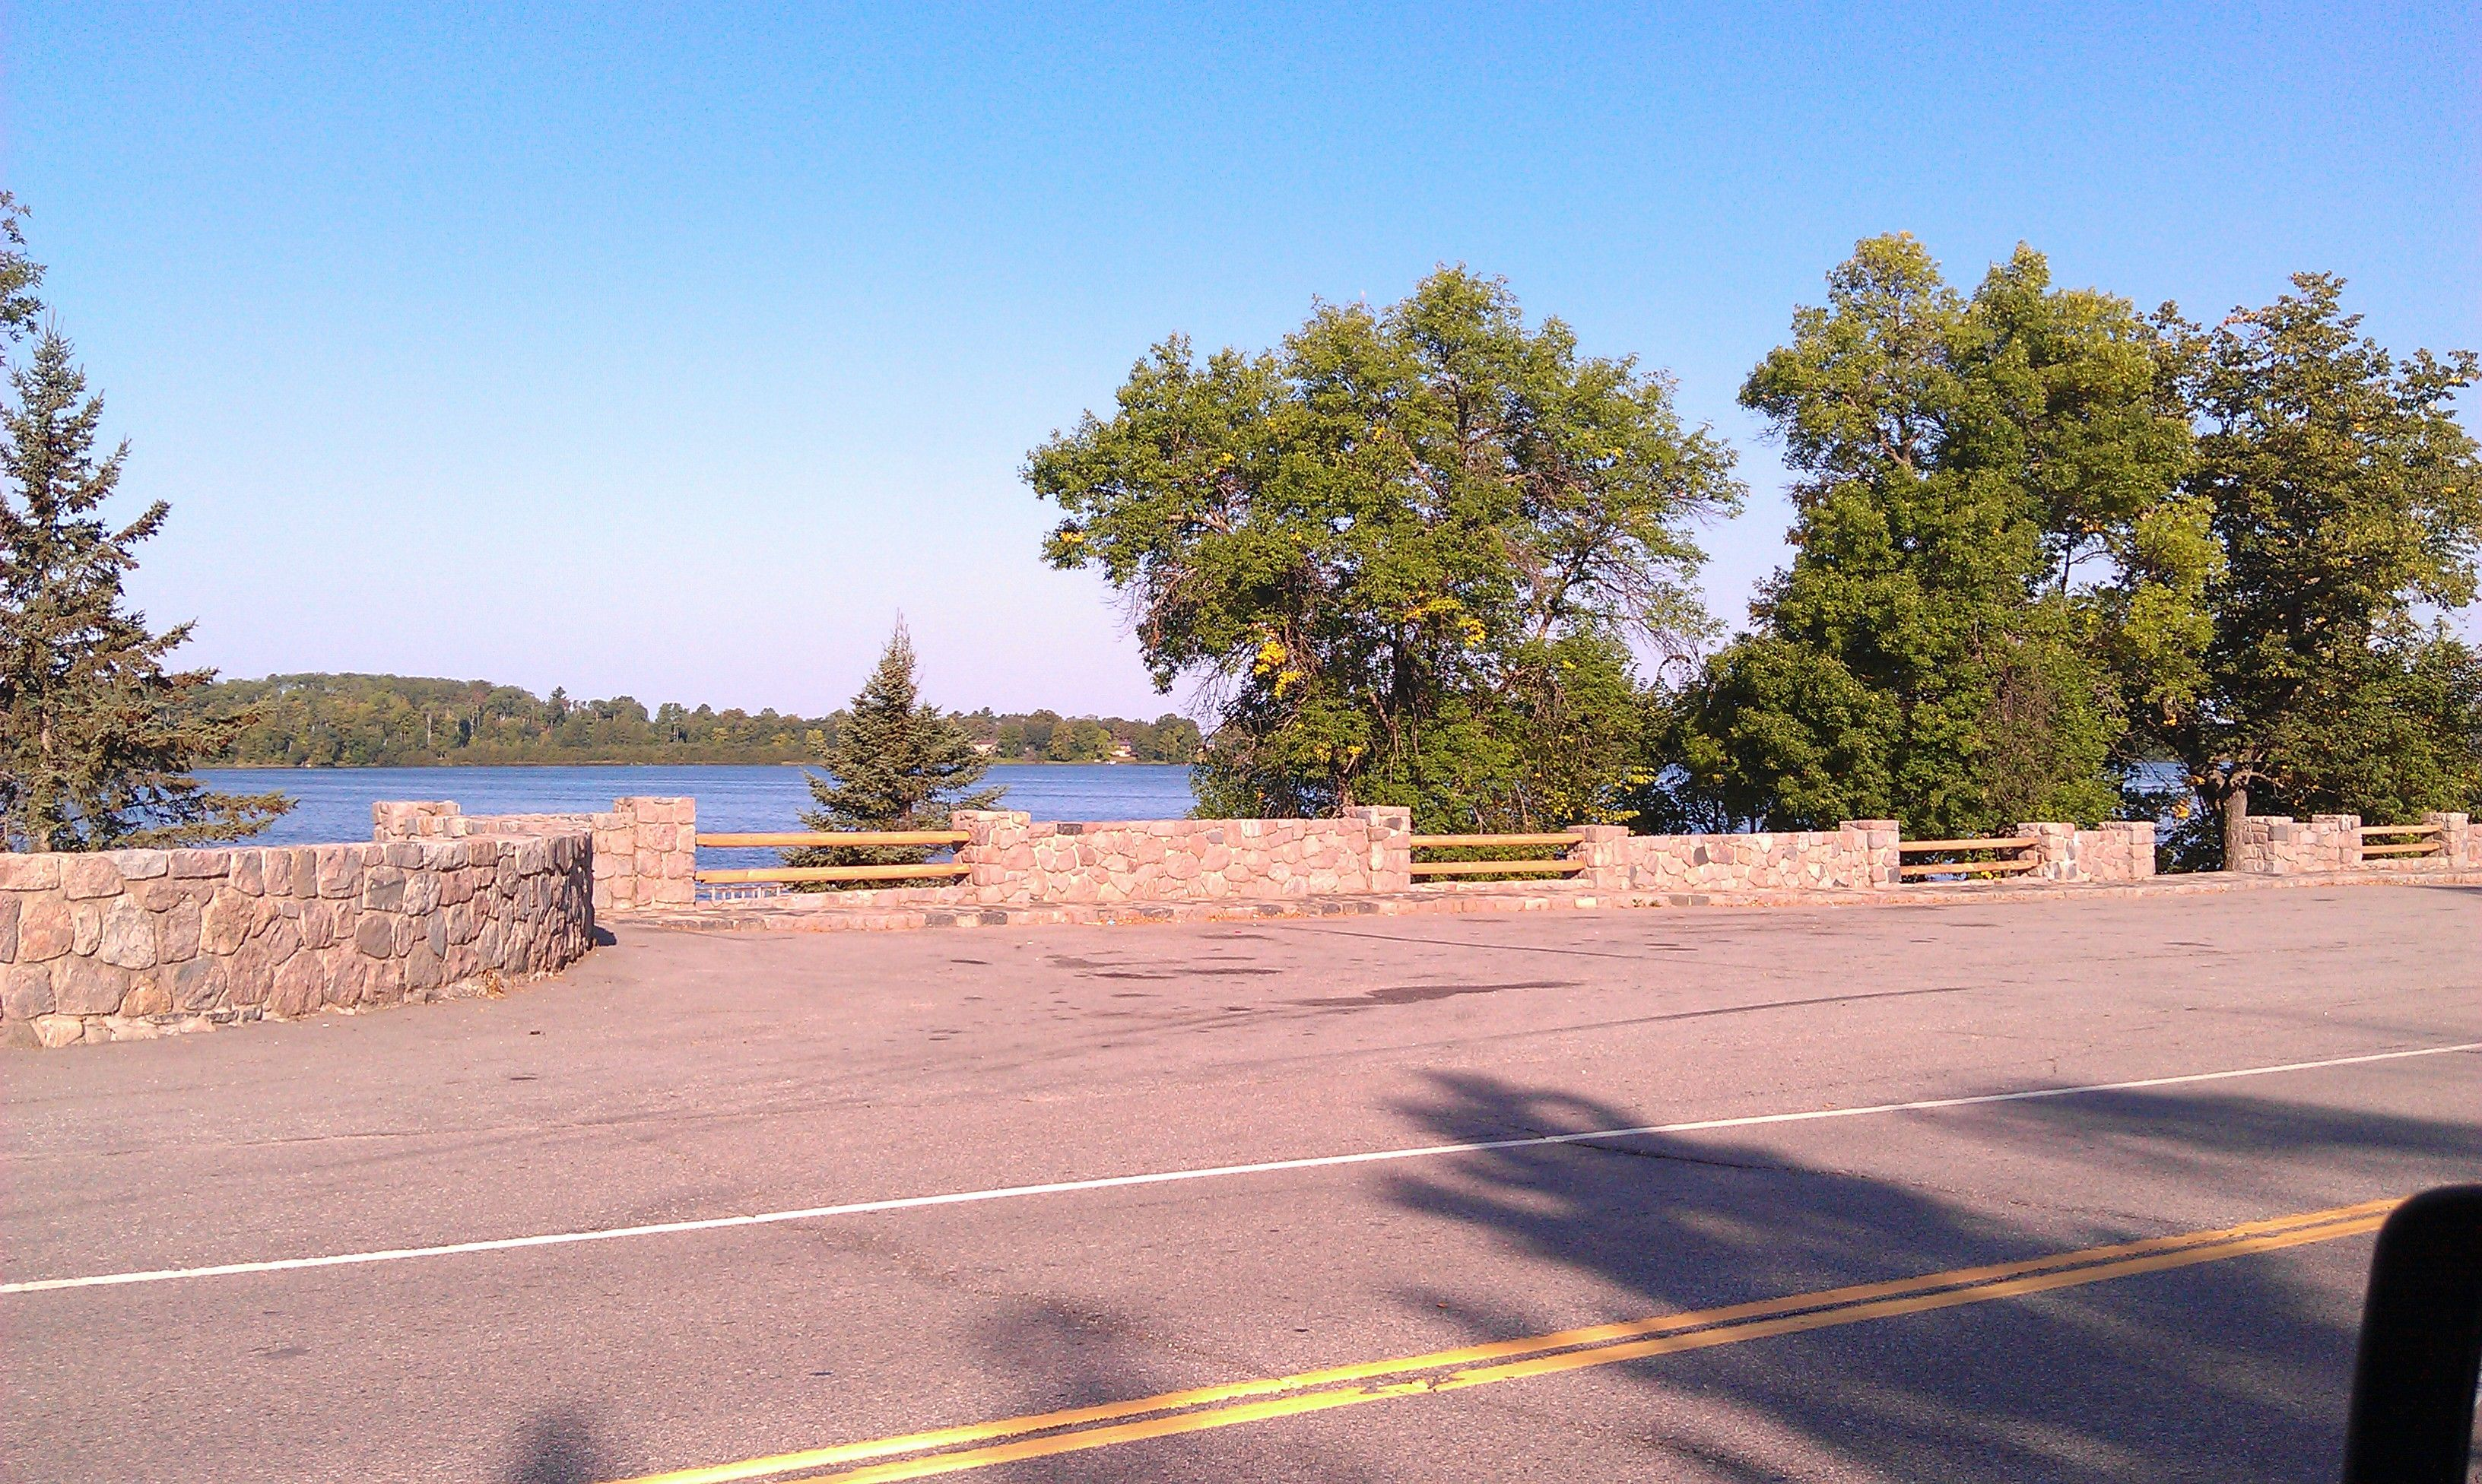 Orr Roadside Parking Area Orr Minnesota State Forest National Register Of Historic Places Civilian Conservation Corps